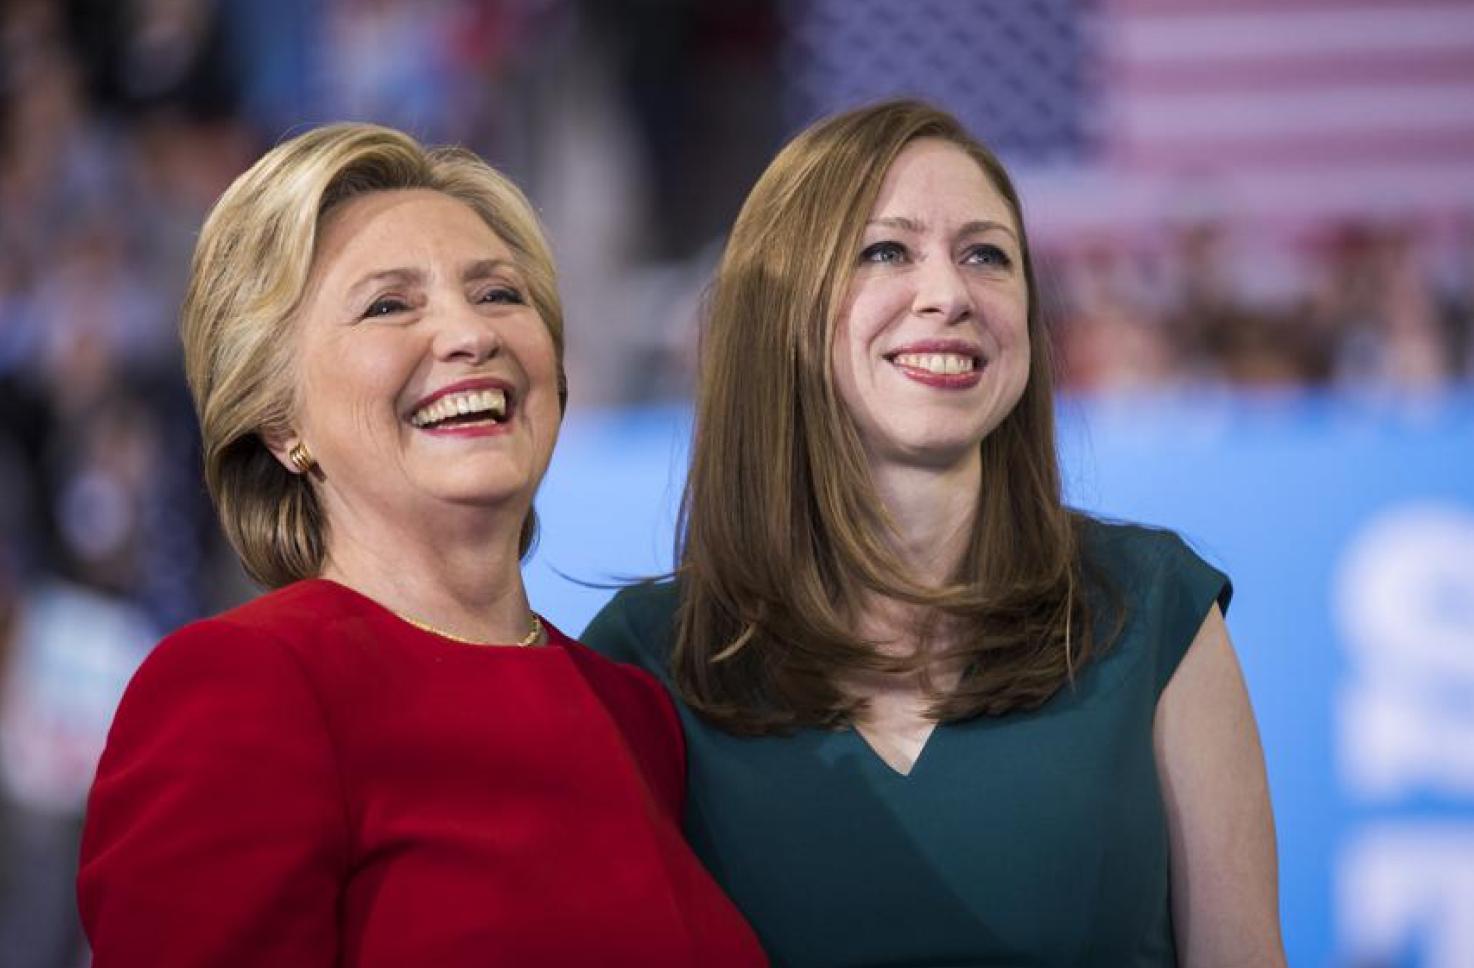 Photo of Hillary Clinton and Chelsea Clinton